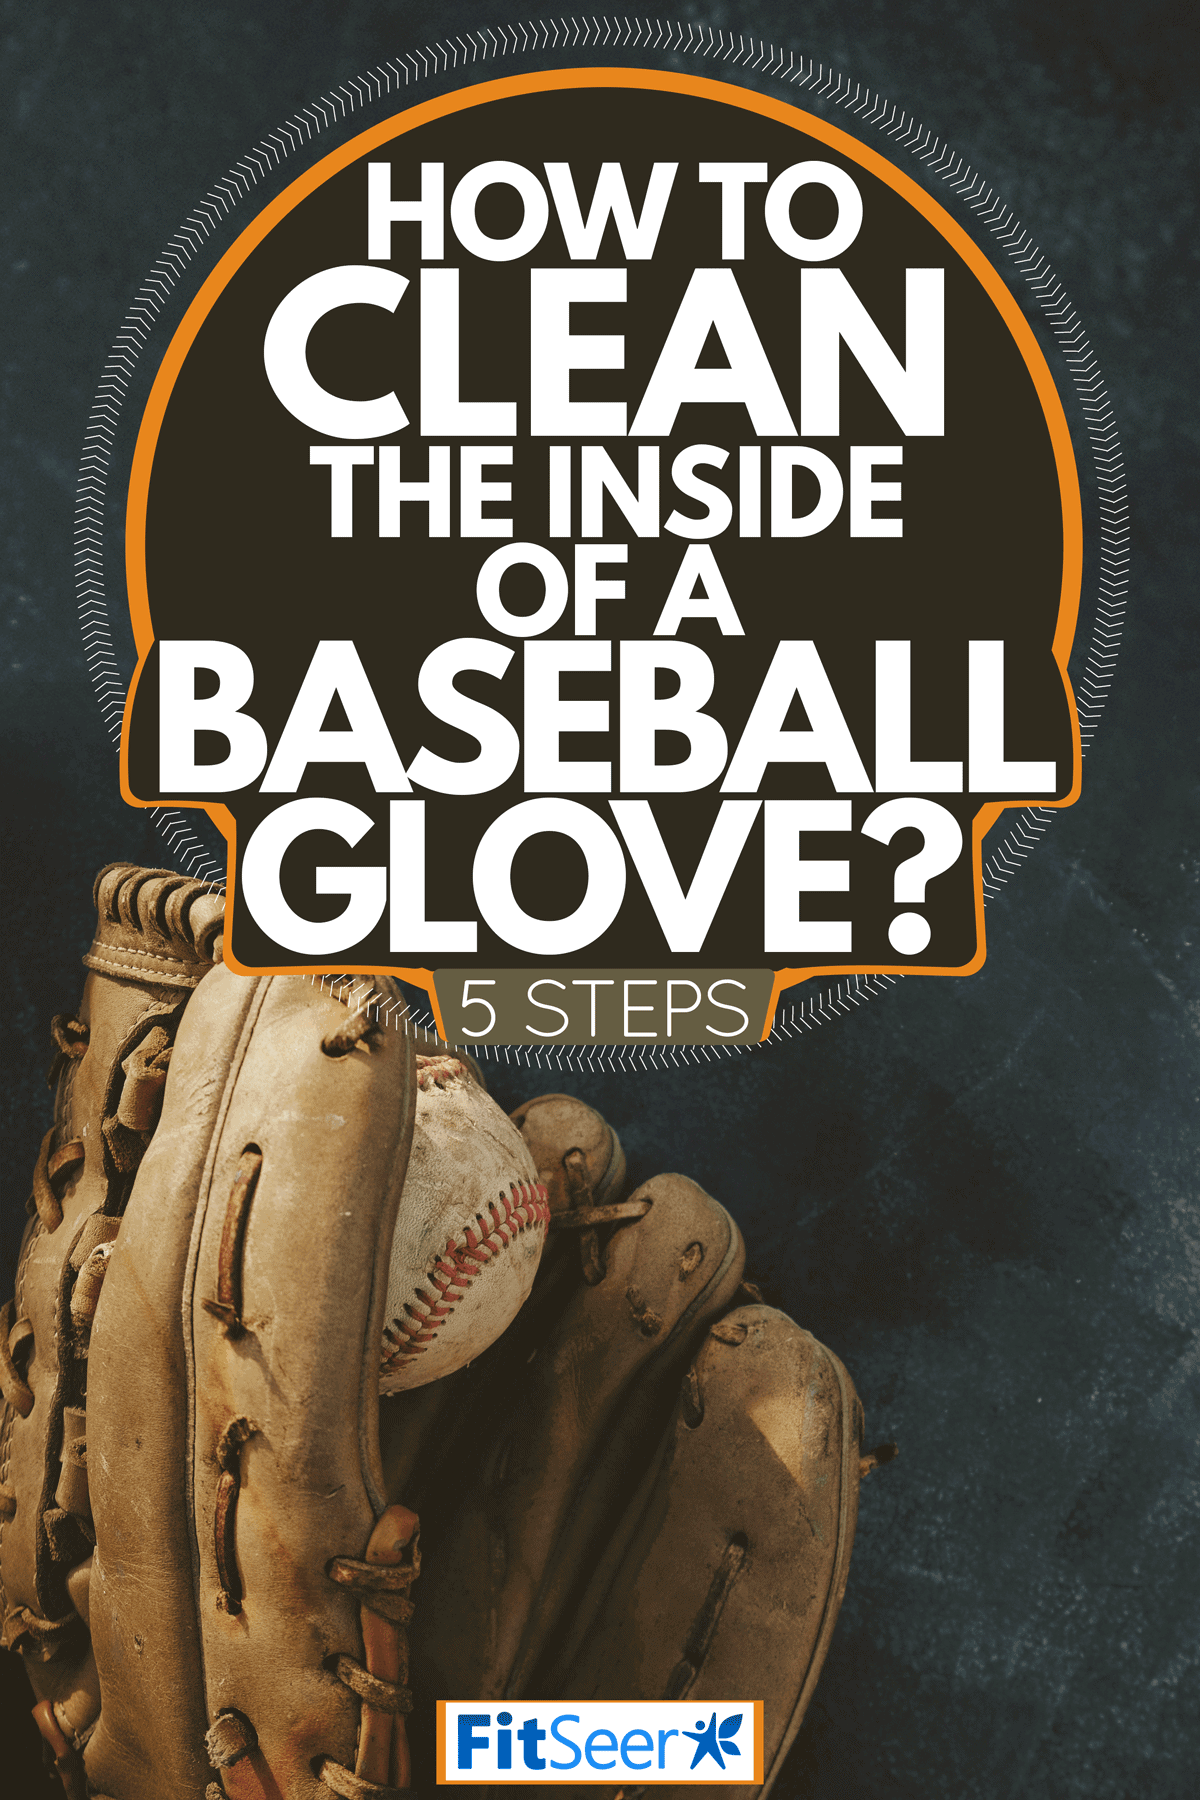 A dirty baseball glove and baseball on a dark background, How To Clean The Inside Of A Baseball Glove? [5 Steps]